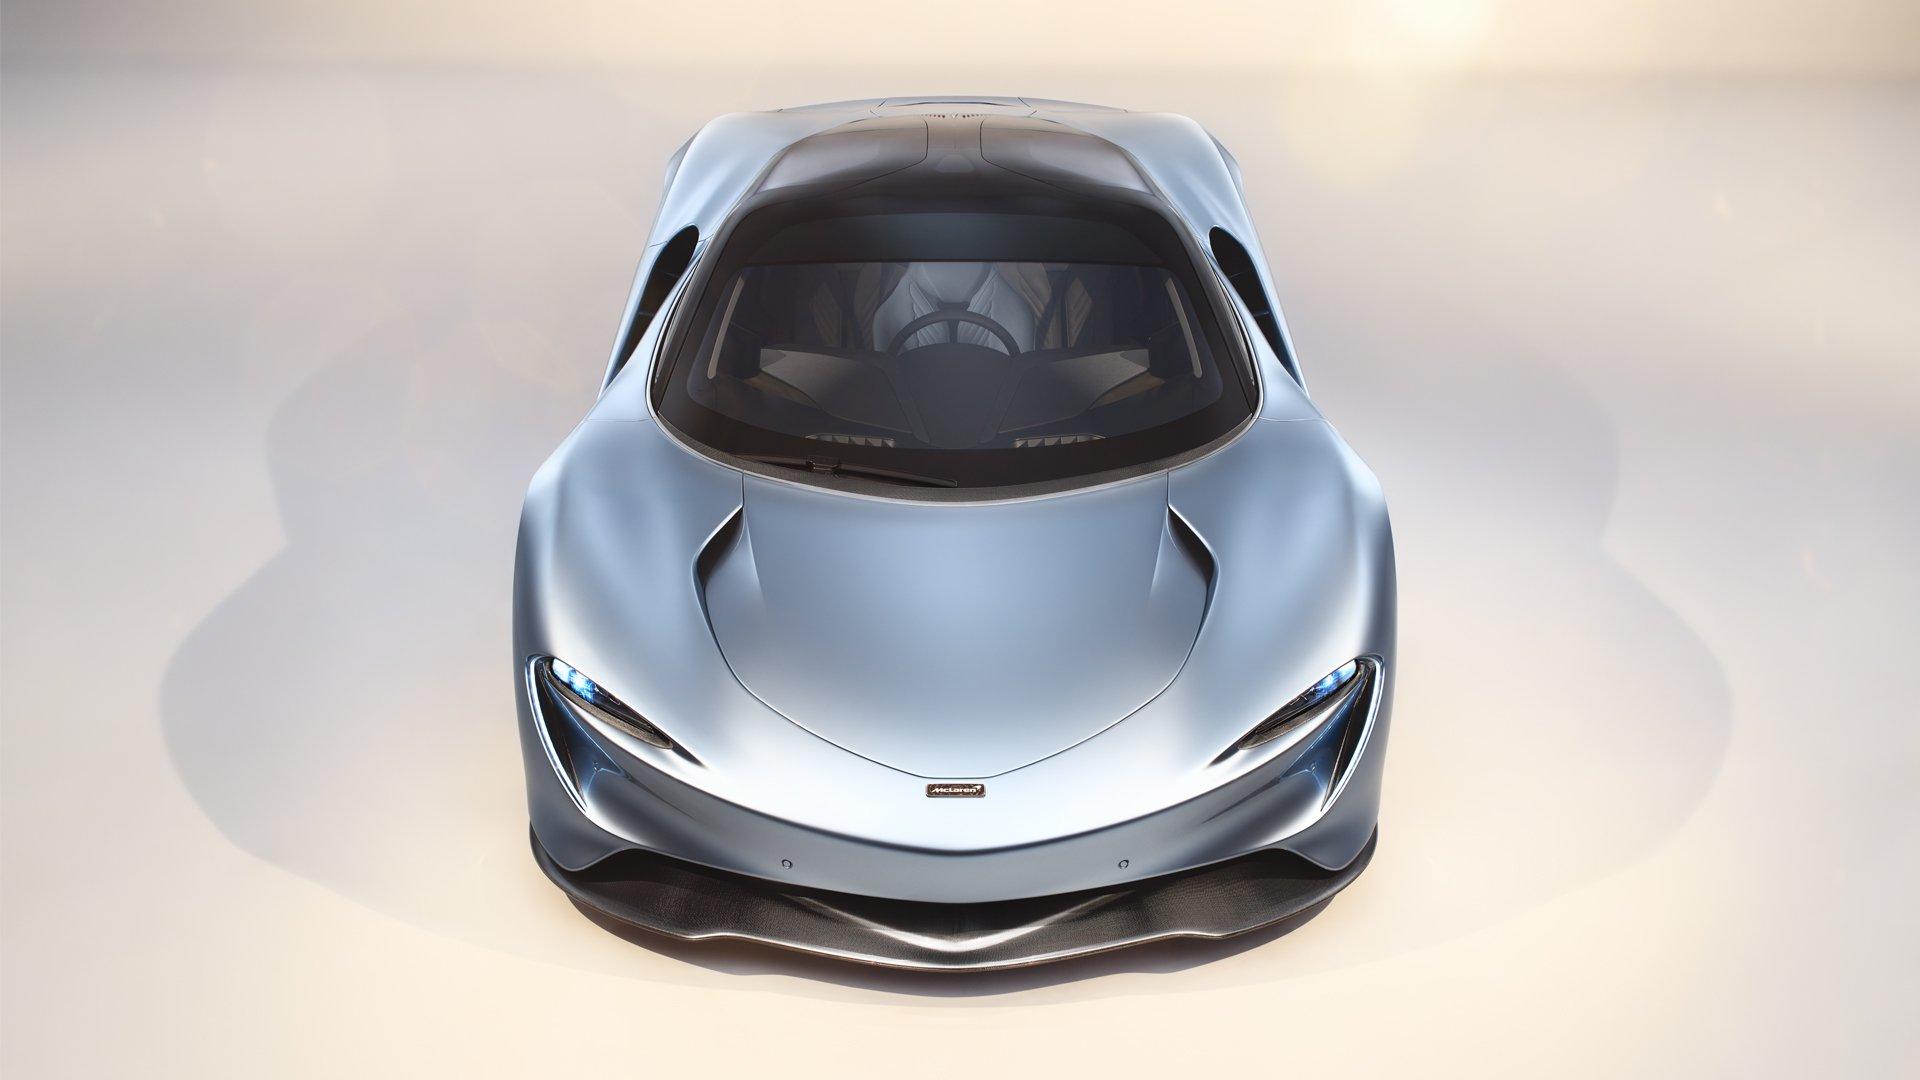 Diamond Collective McLaren speedtail blog post image nine